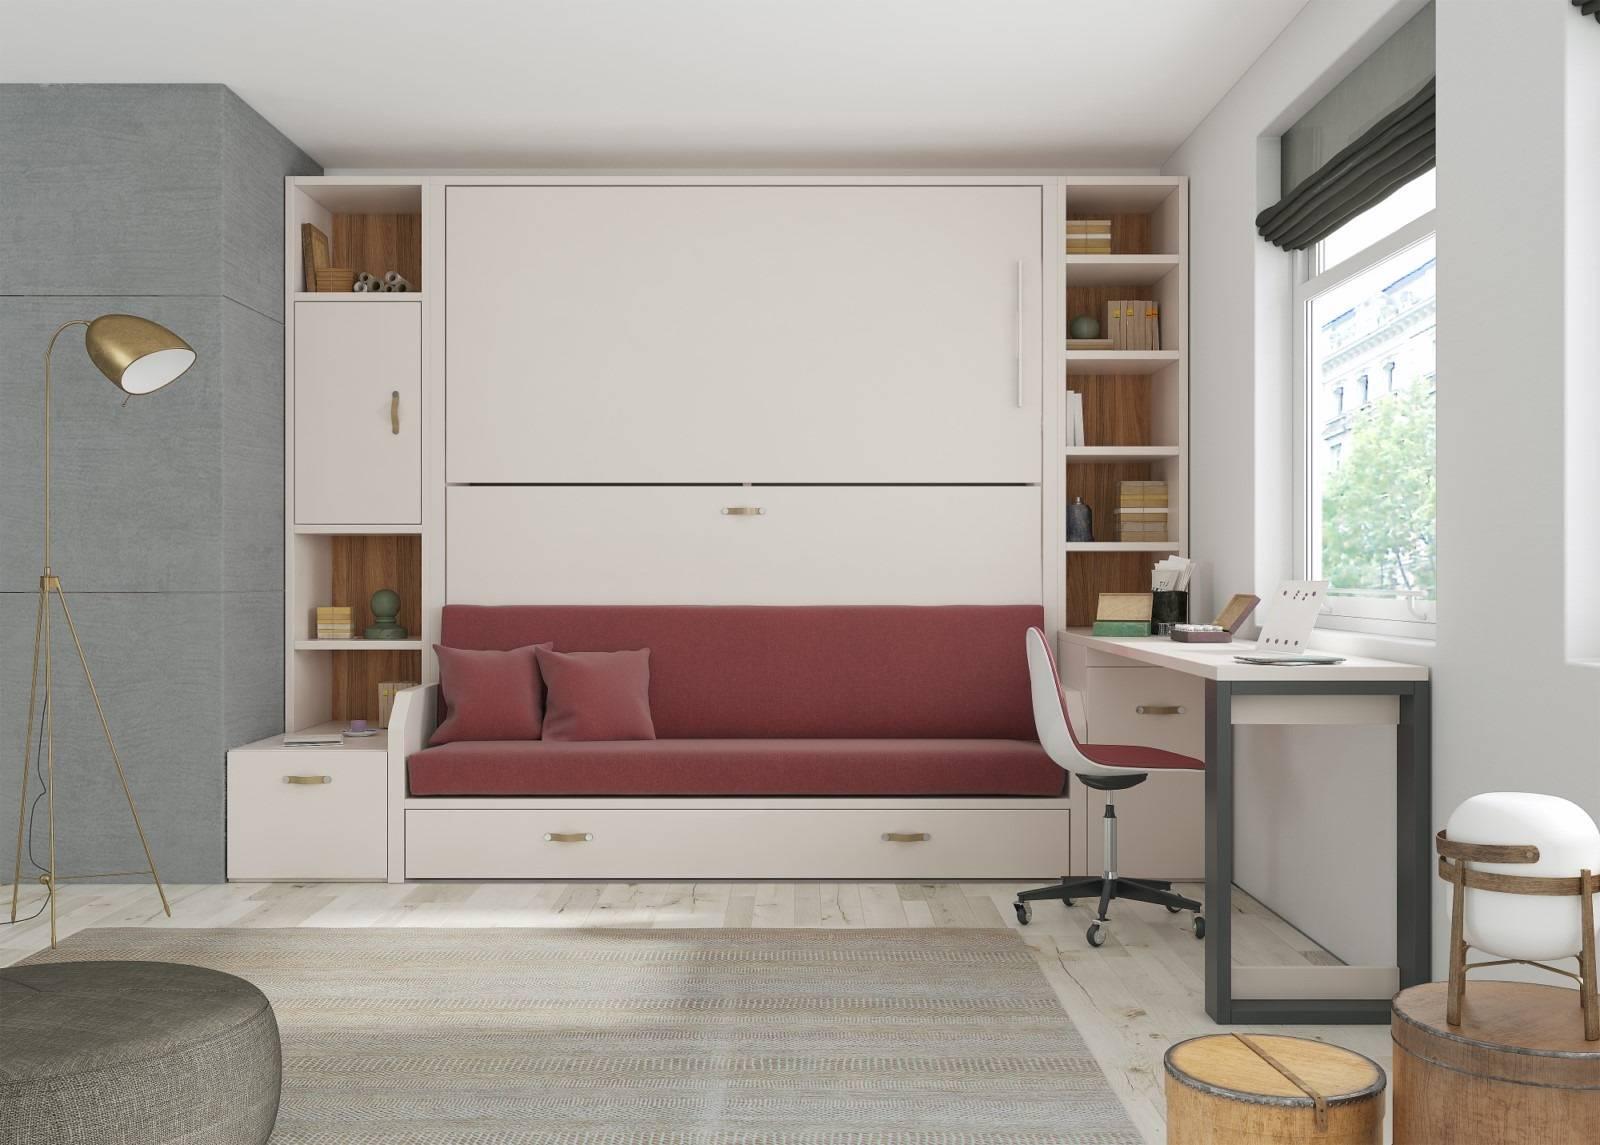 lit superpos escamotable avec canap int gr ajaccio. Black Bedroom Furniture Sets. Home Design Ideas